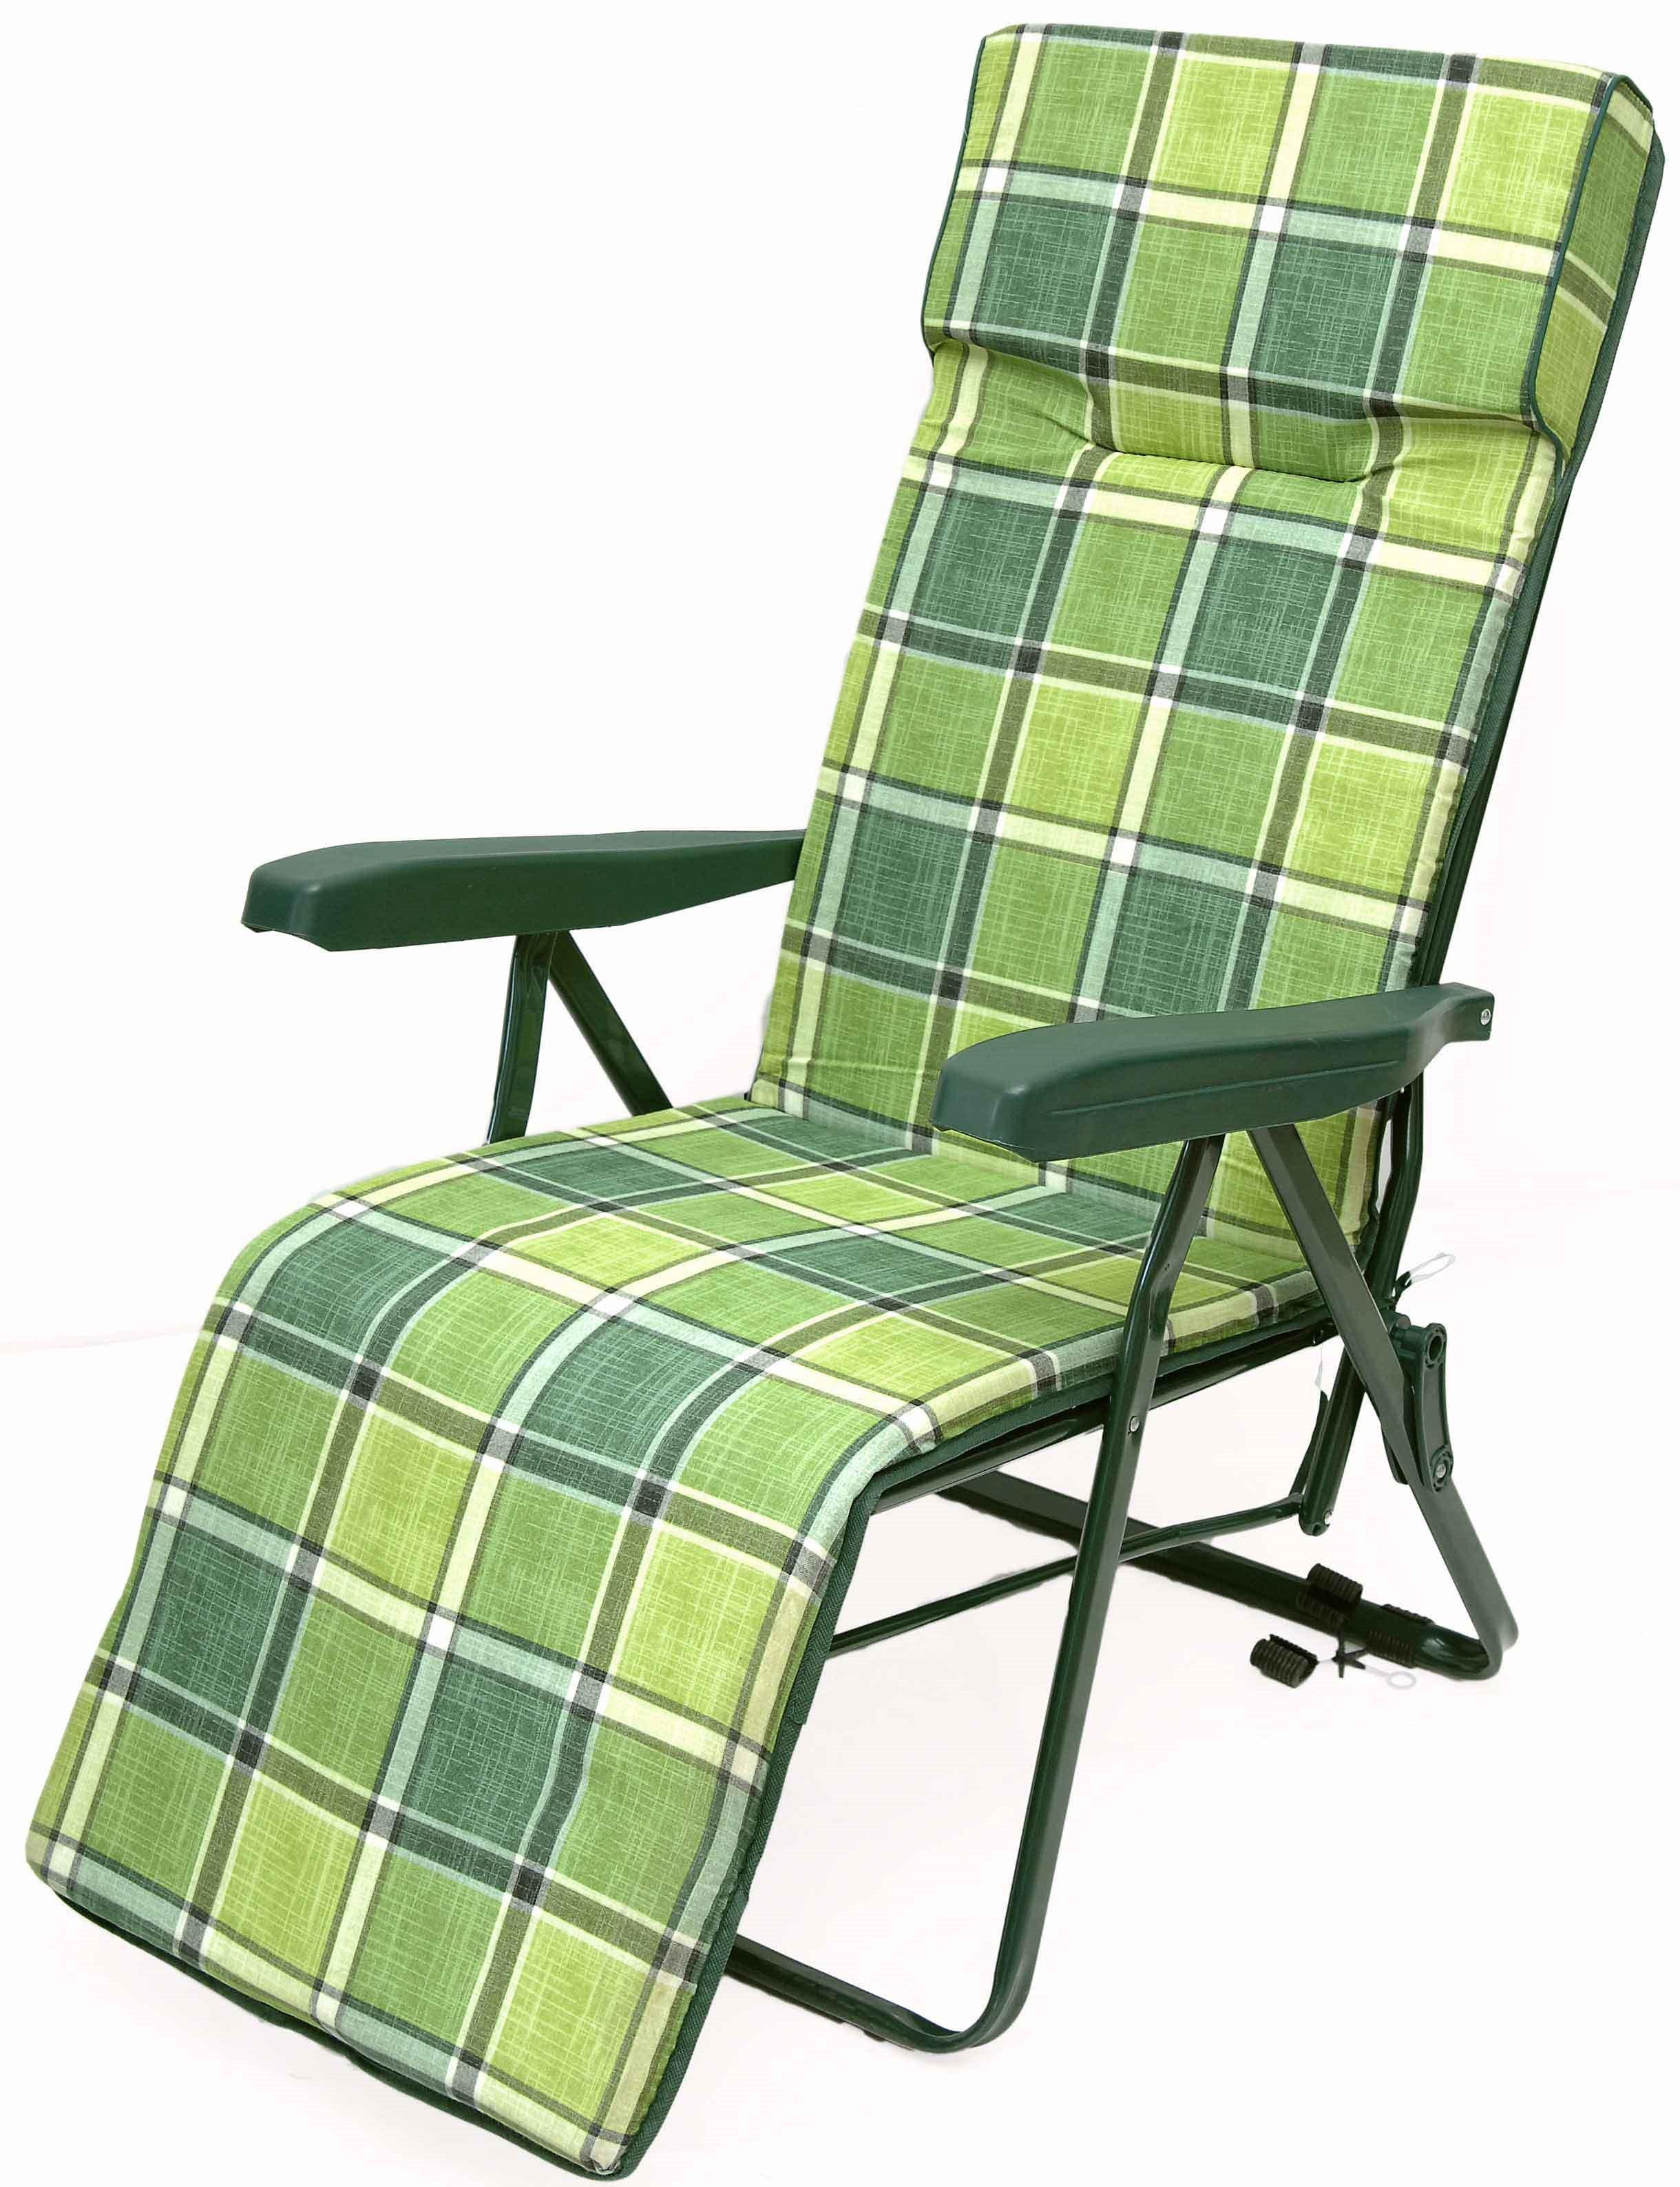 Campus πολυθρόνα κρεβάτι μεταλλική πράσινη καρώ ενισχυμένη πολλαπλών θέσεων